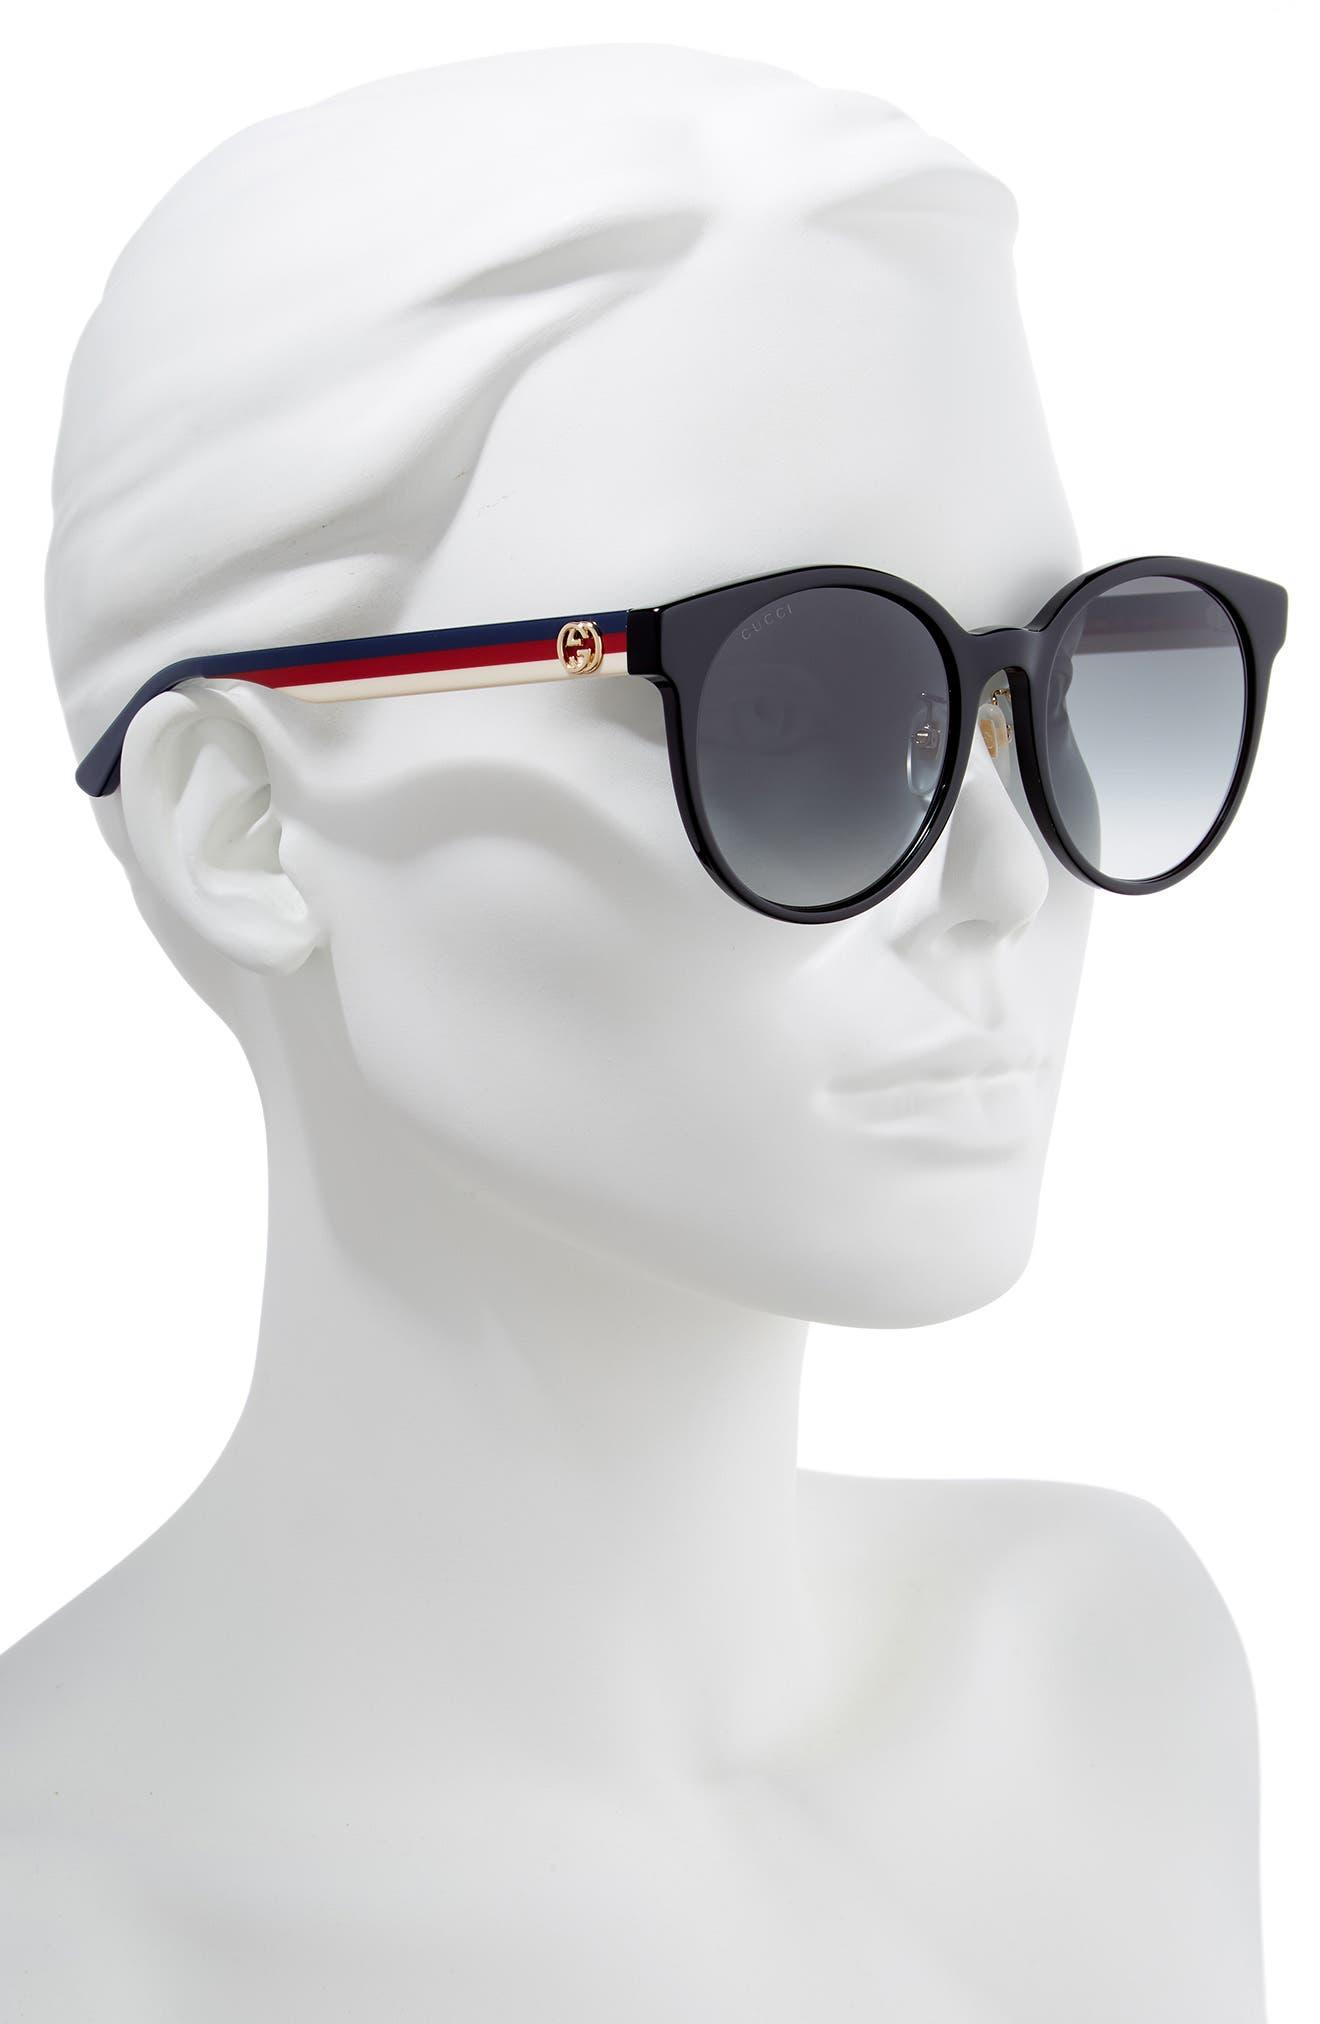 GUCCI, 55mm Round Sunglasses, Alternate thumbnail 2, color, BLACK/ MULTI/ GREY GRADIENT